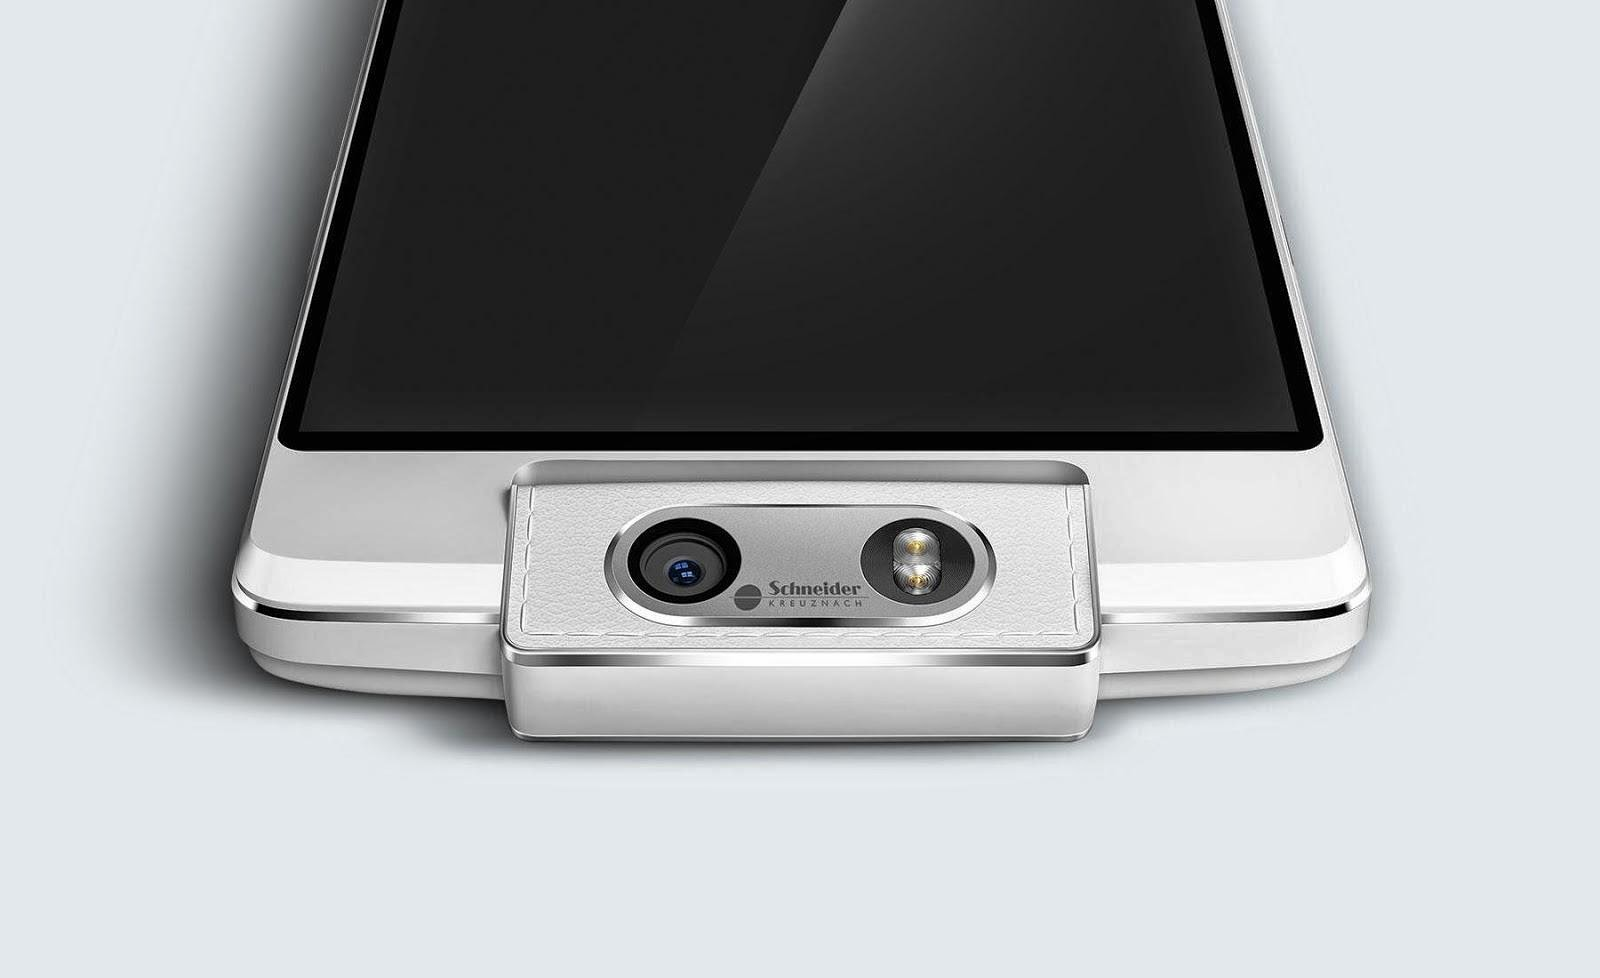 Kamera Putar Otomatis - OPPO N3